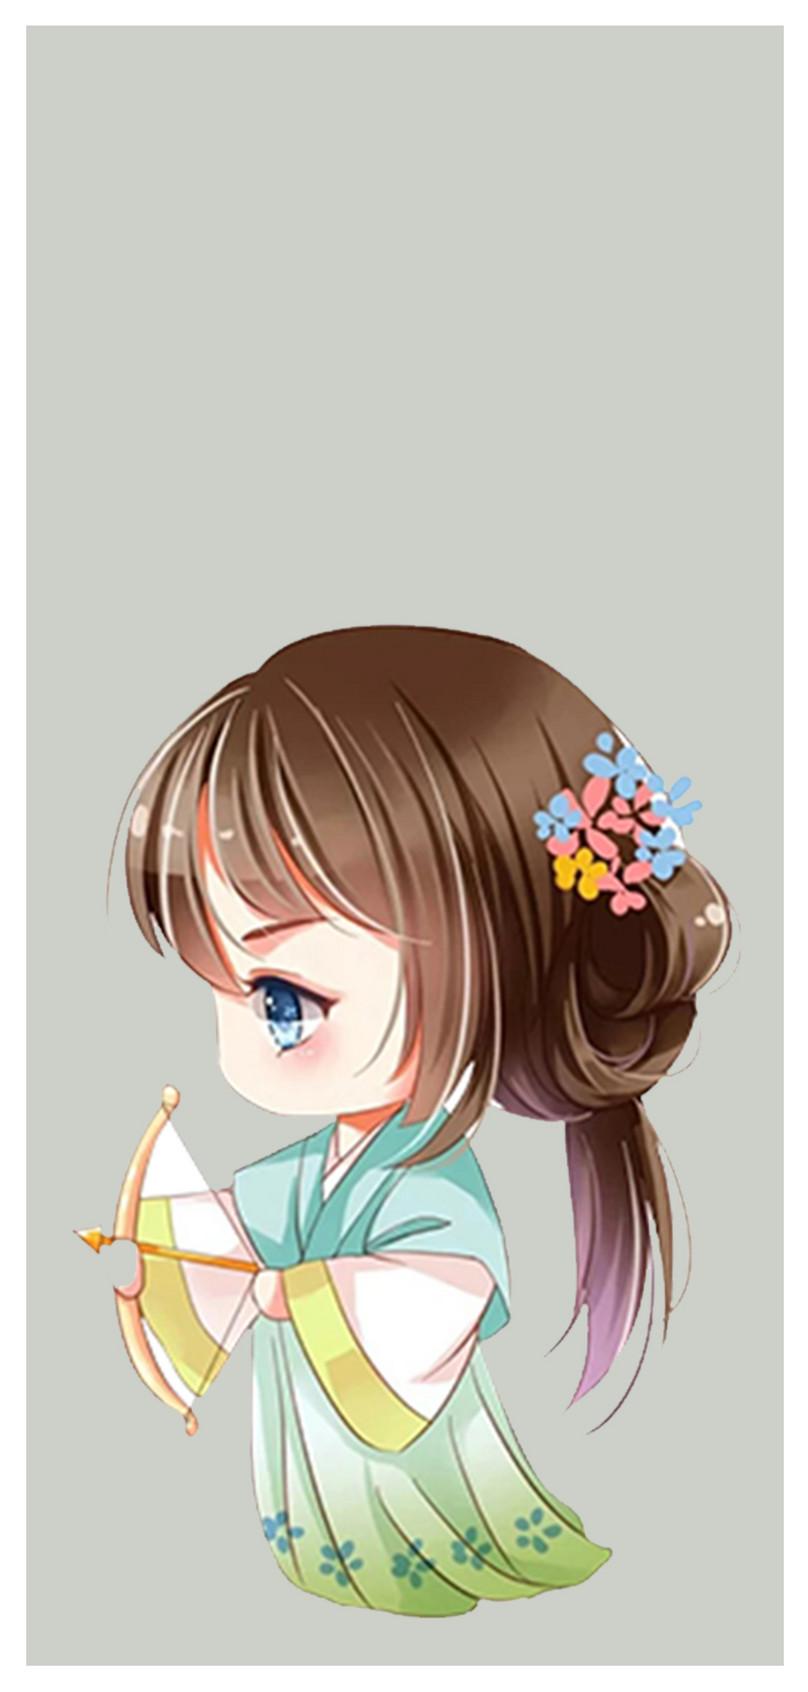 Cartoon Cute Girl Mobile Wallpaper - Anime Girls As Sagittariuses , HD Wallpaper & Backgrounds